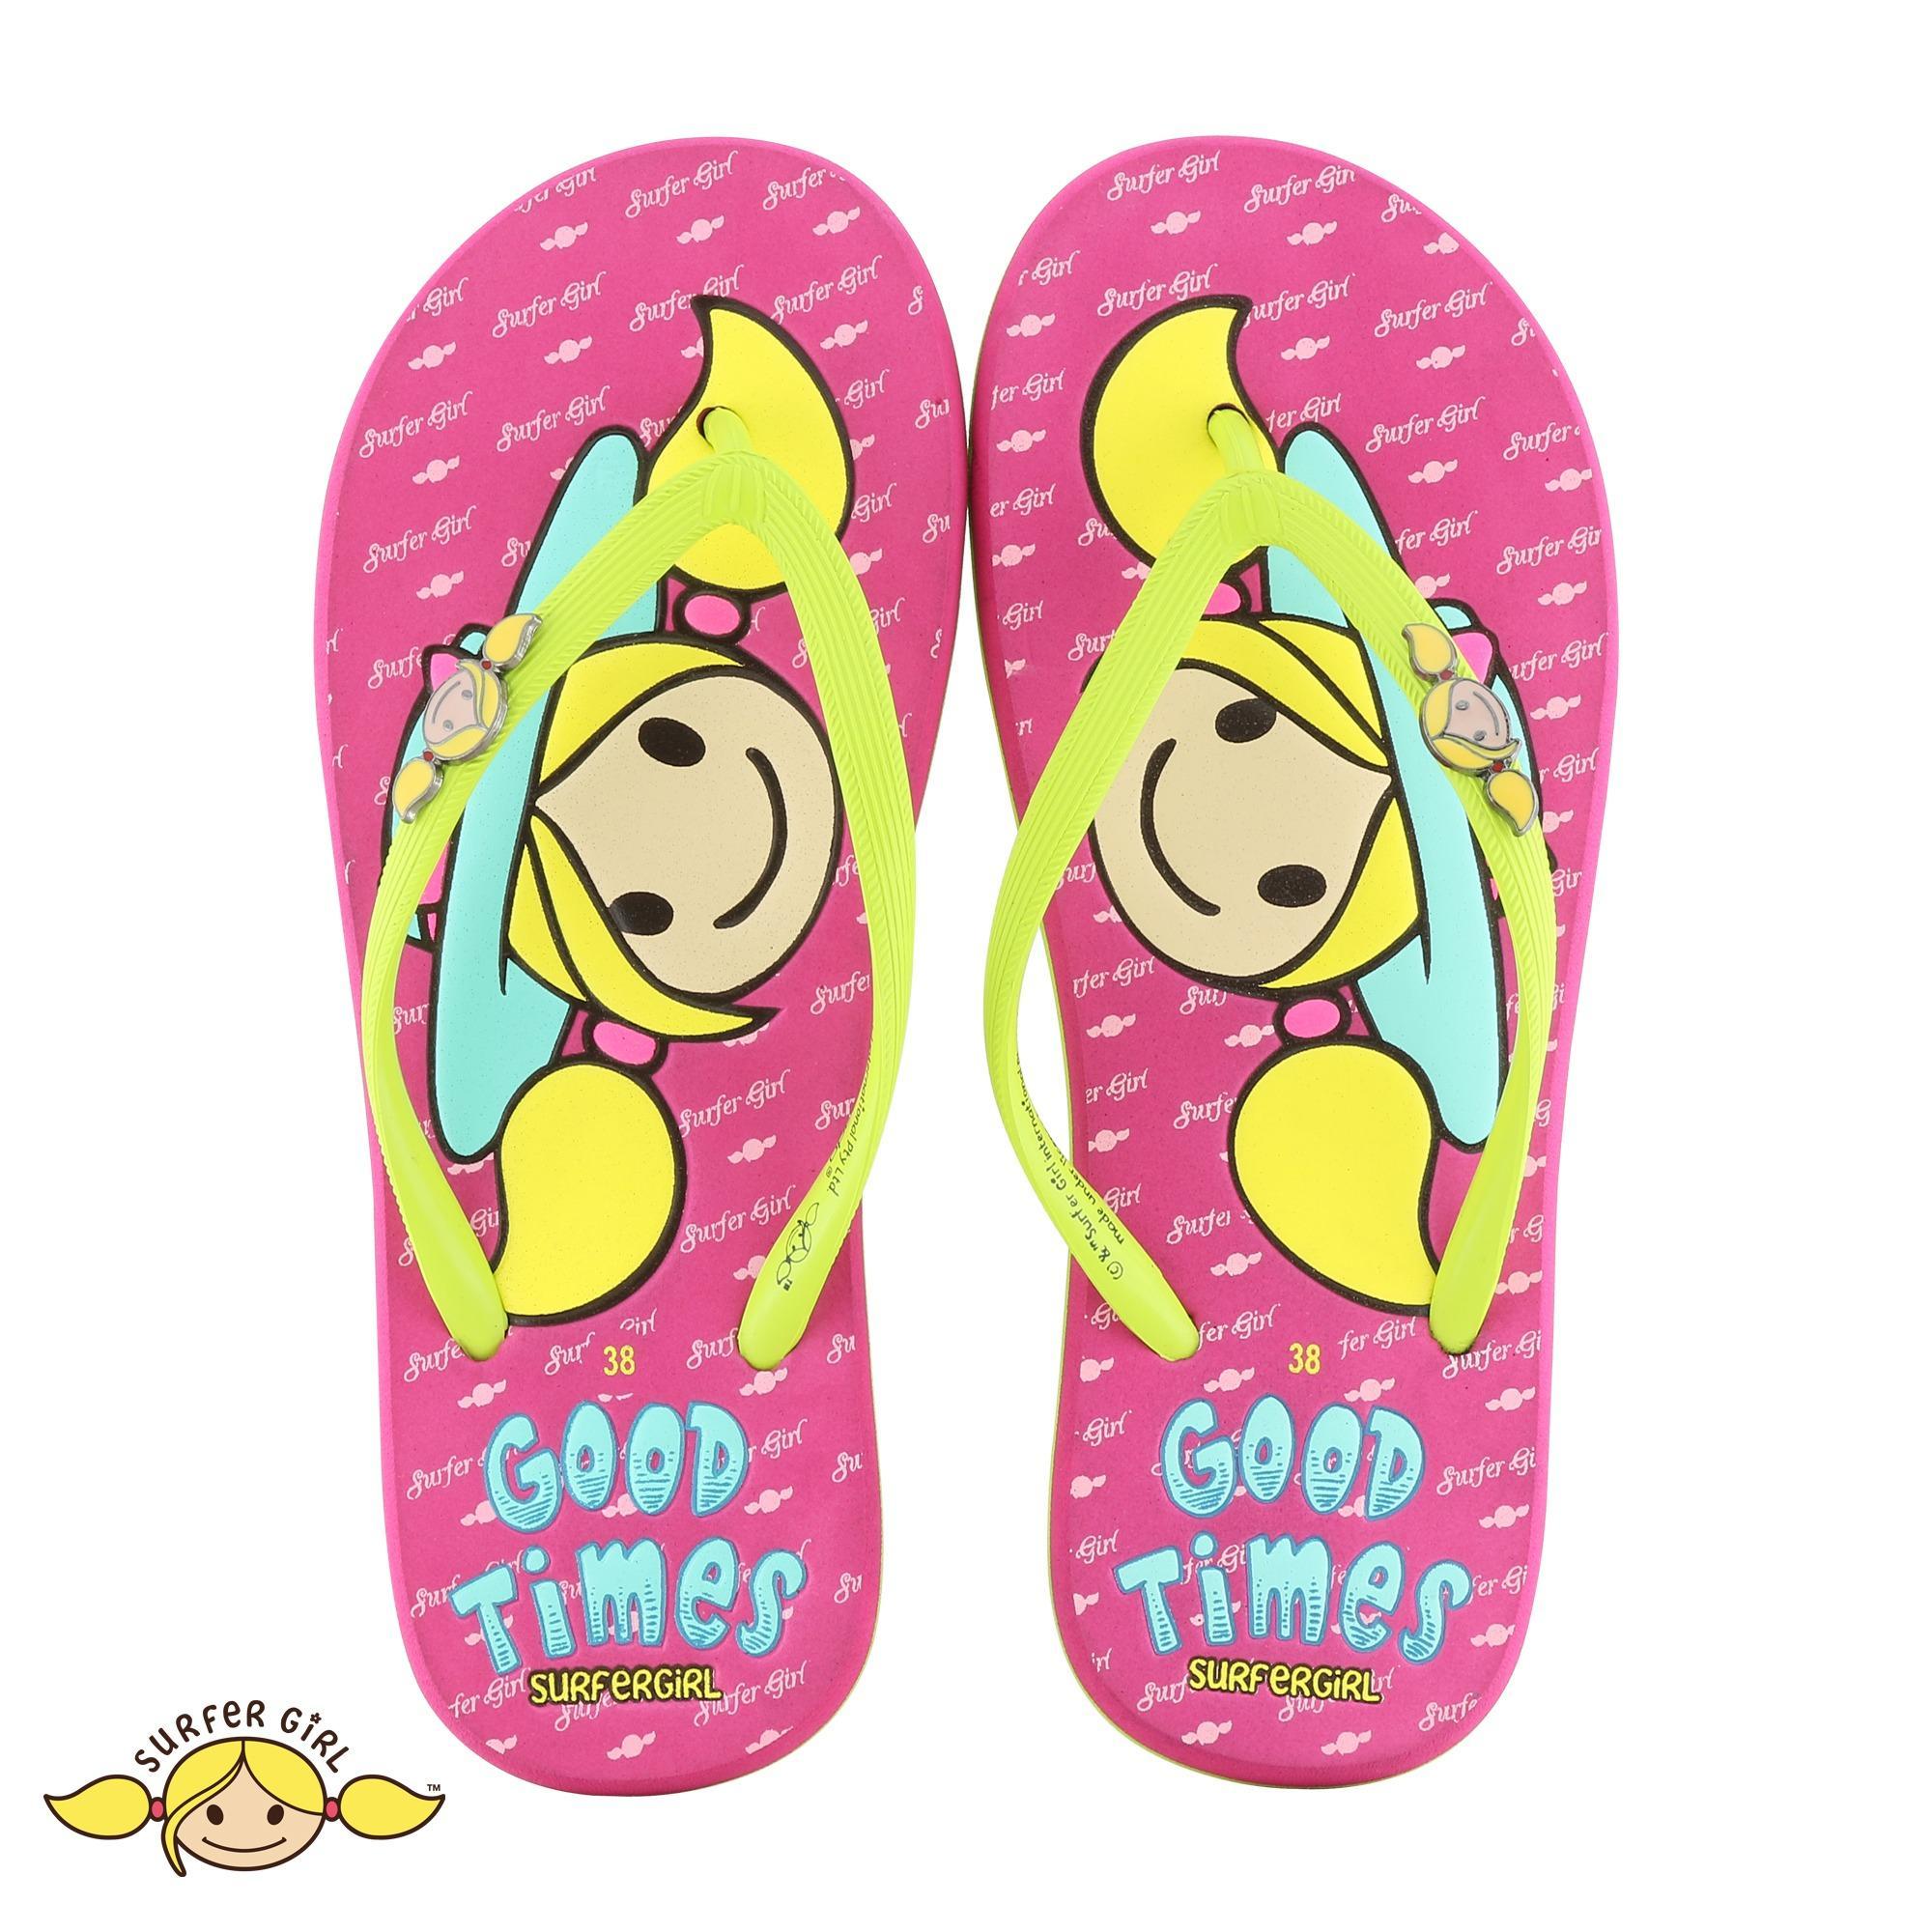 5524fe40b6d5 Sandal Flip Flop Surfer Girl Limited Edition SGL 481  Lime-Fusia